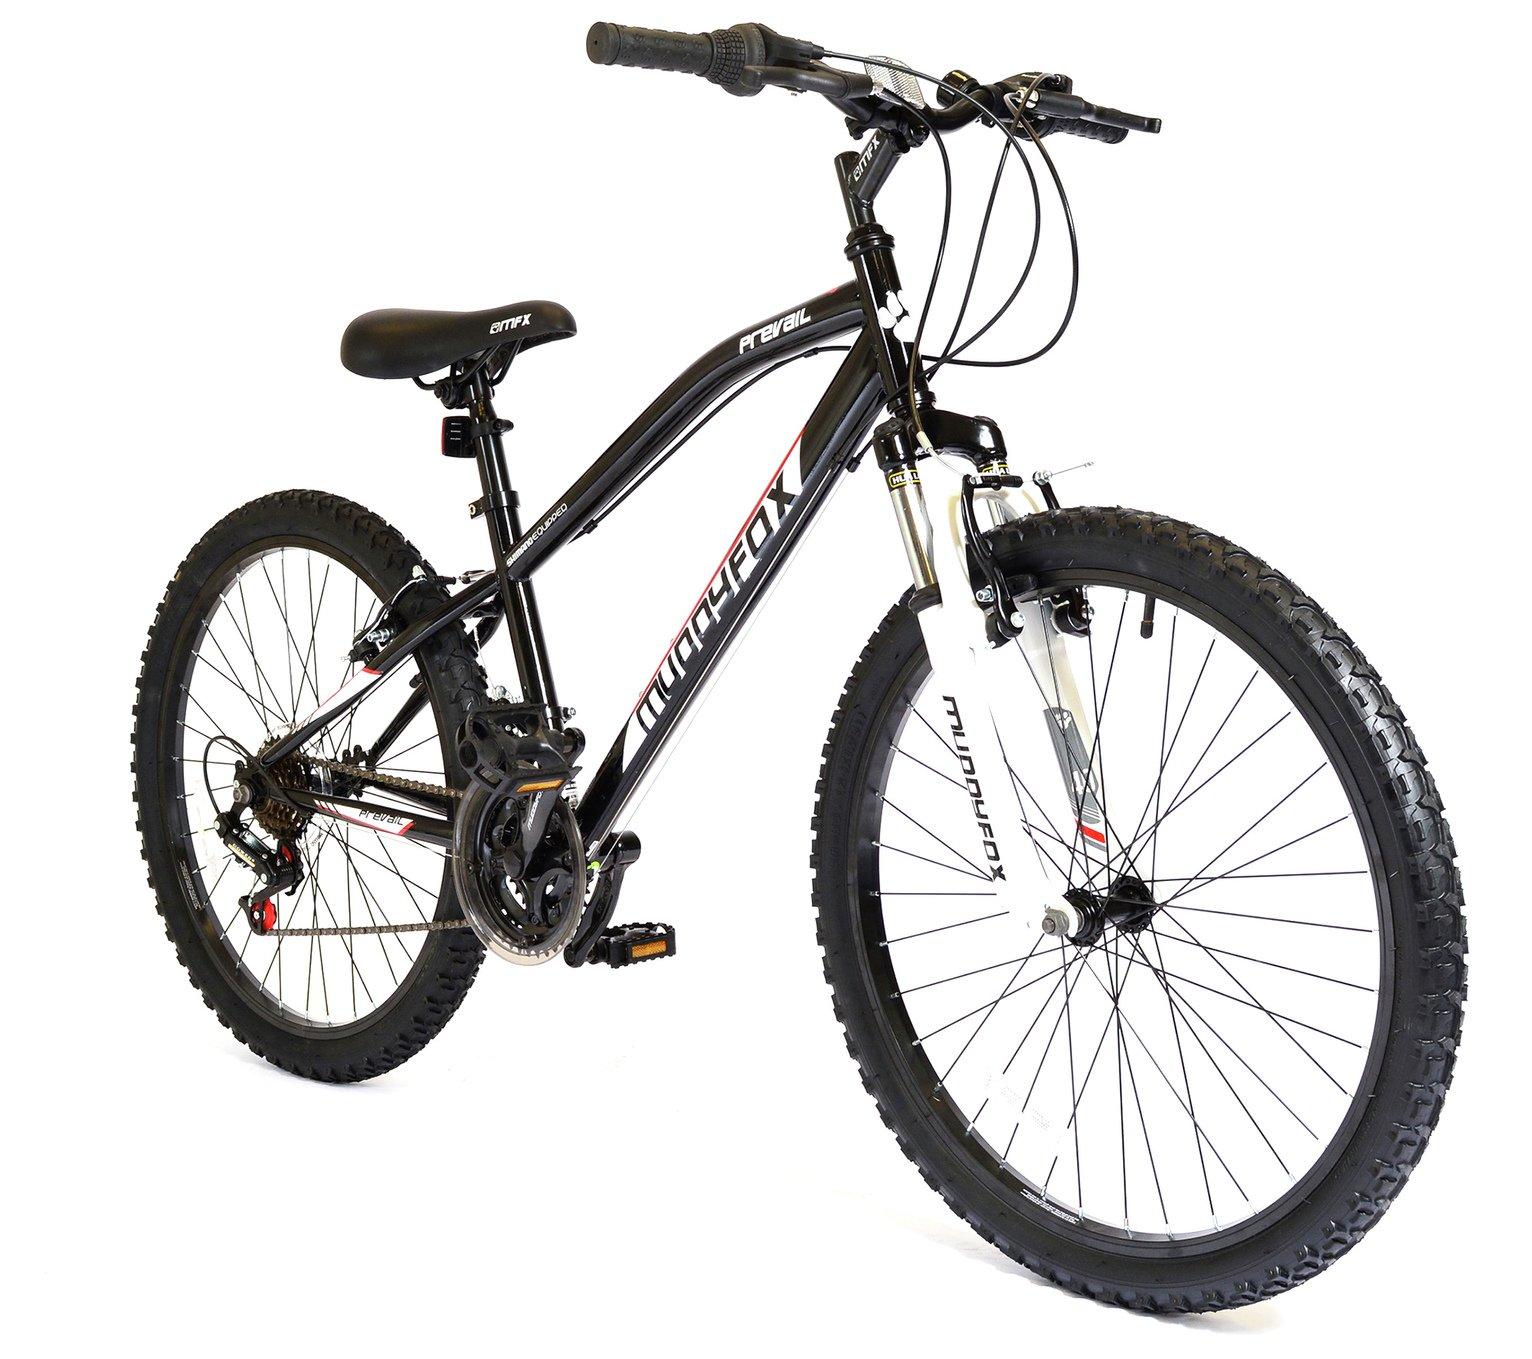 Muddyfox Prevail Hardtail Bike